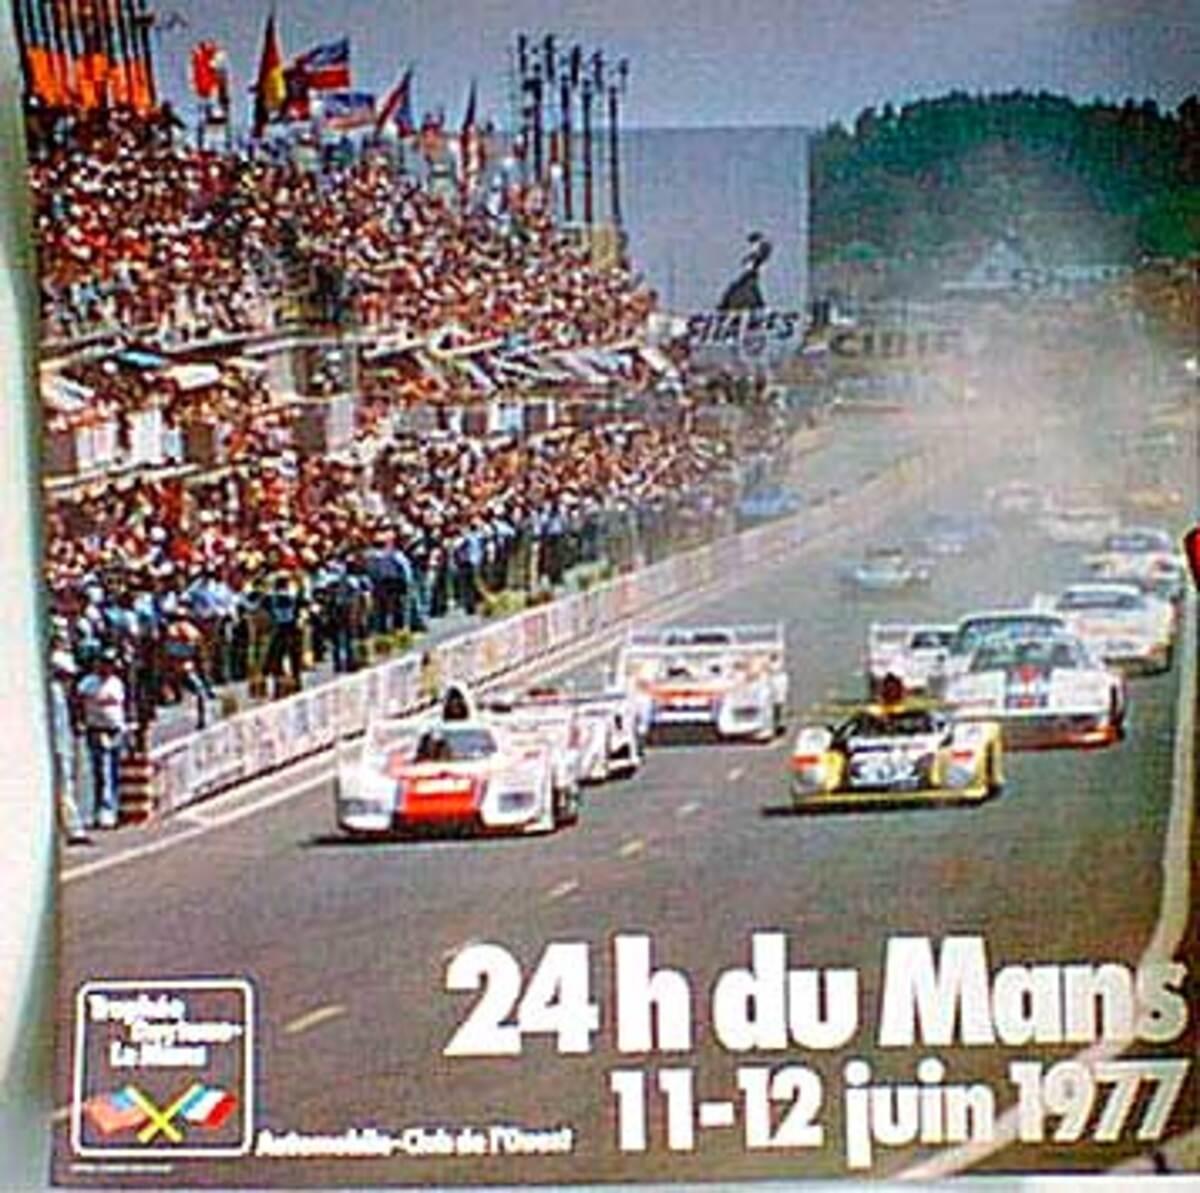 24 hours Le Mans 1977 Original F1 Racing Poster